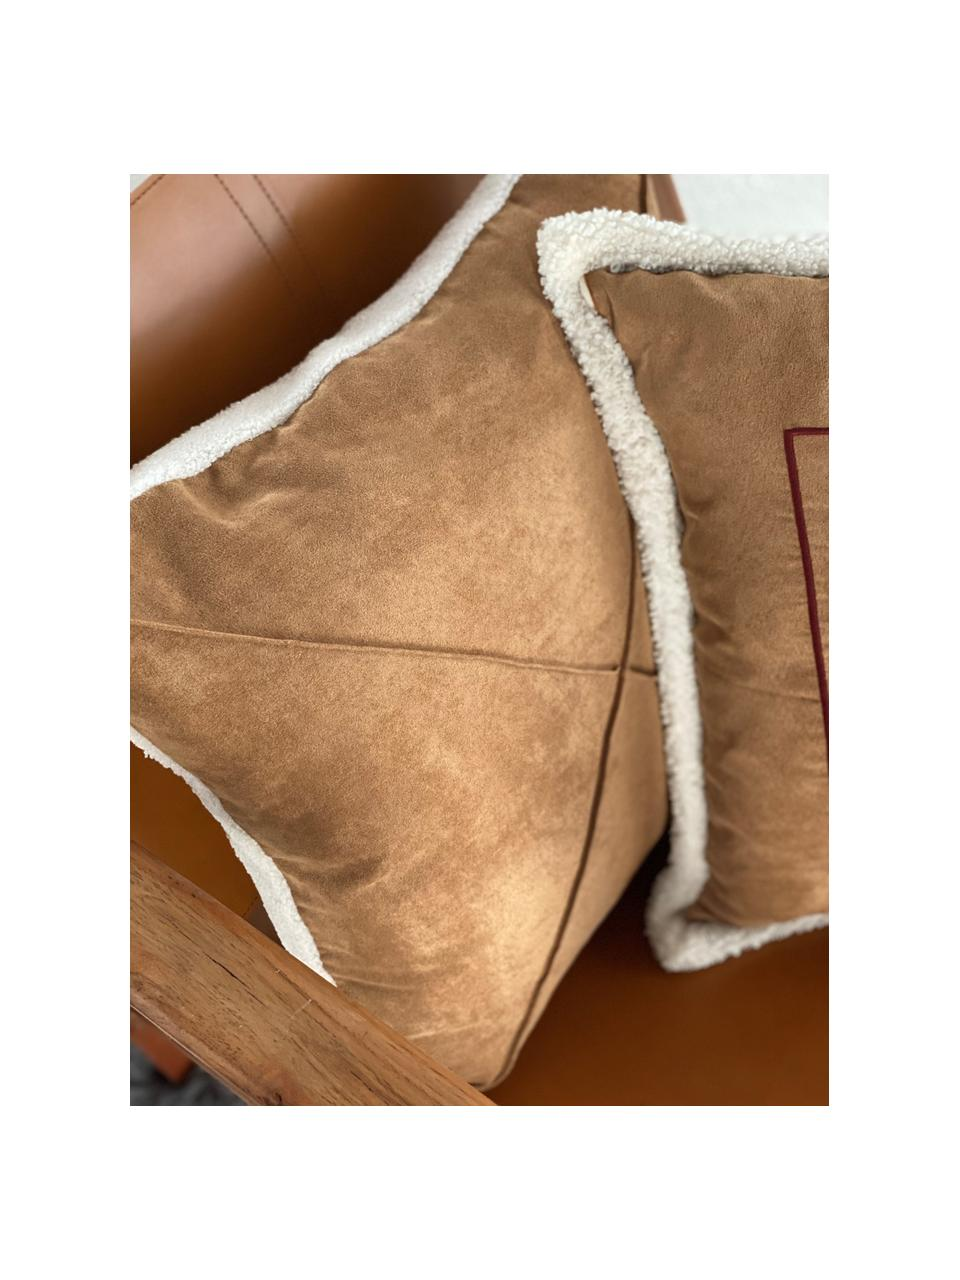 Kissenhülle Tahoe Braun/Weiß in Lederoptik mit Teddyfell-Keder, 100% Polyester, Hellbraun, 50 x 50 cm